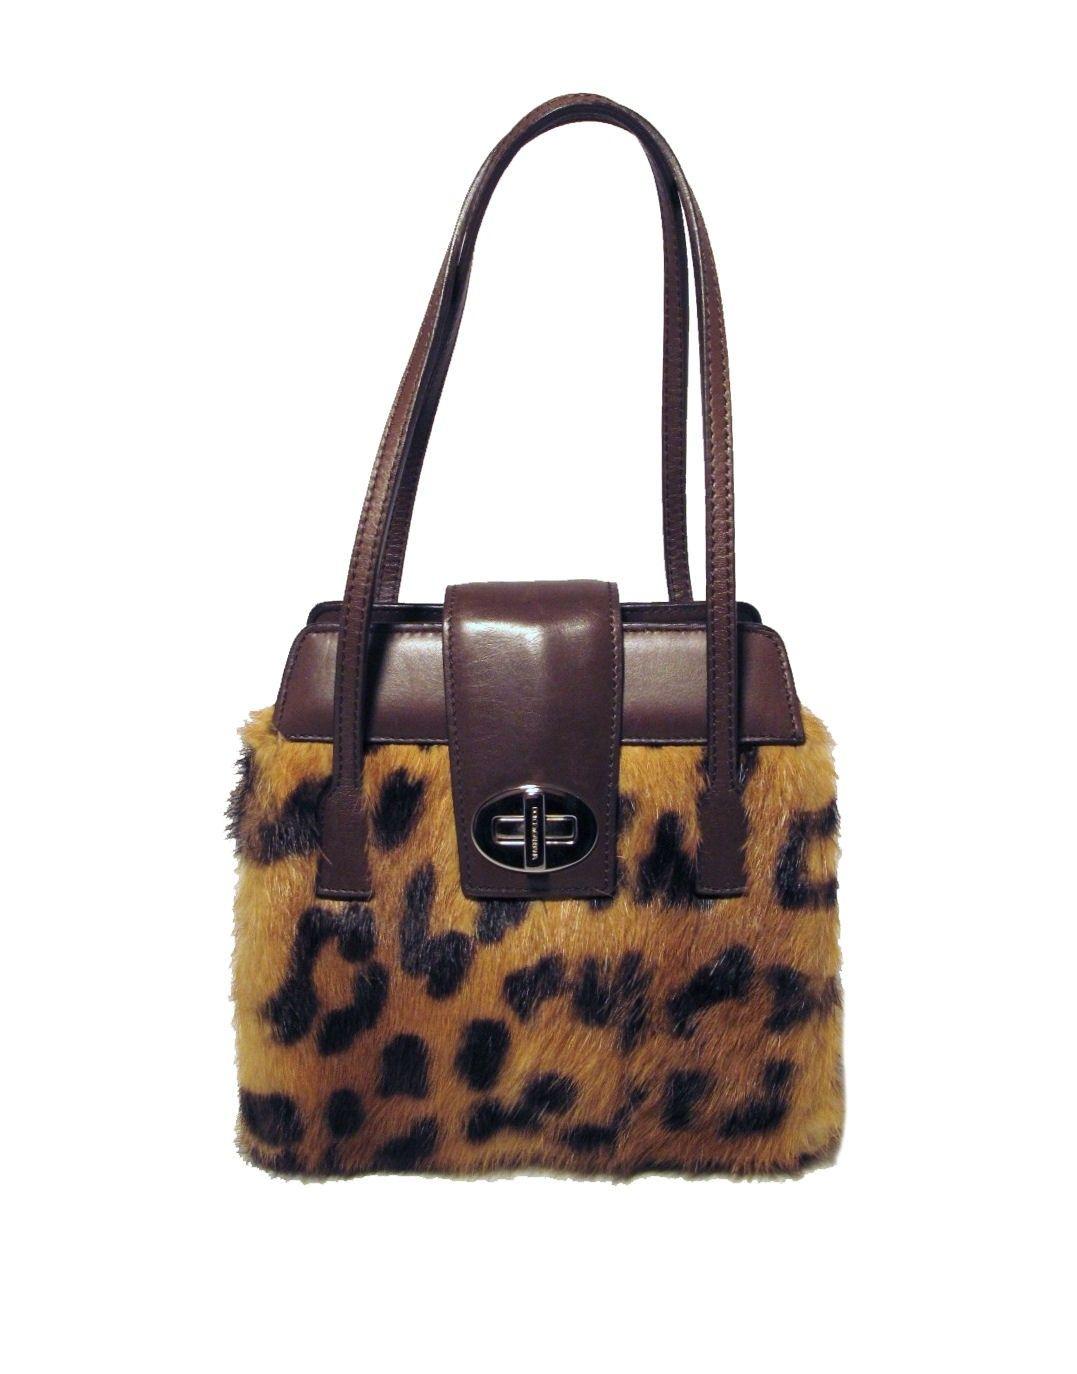 Dolce Gabbana Leopard Print Fur Bag Review Buy Now  42db77e3aa29a